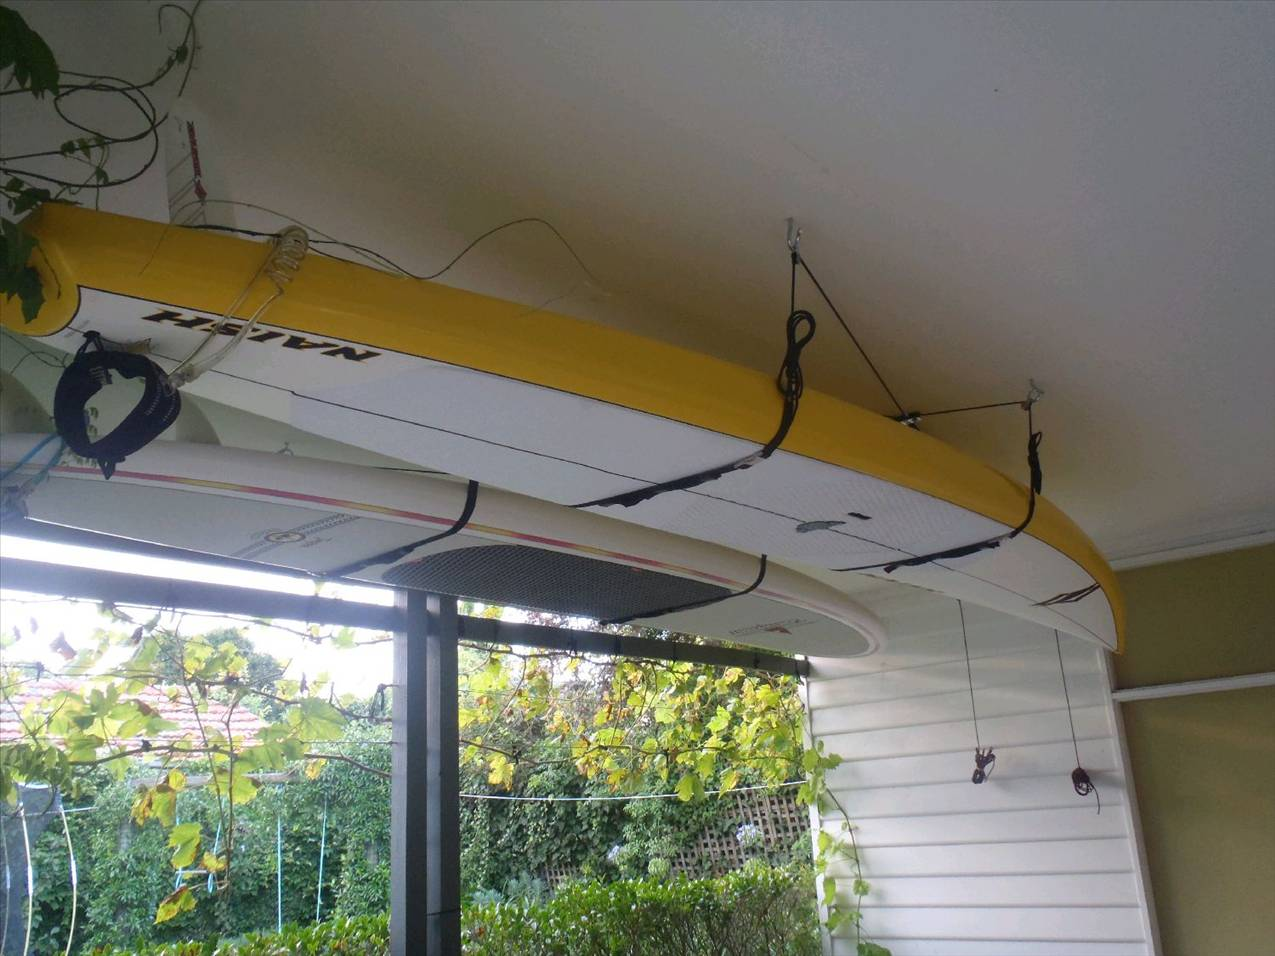 Sup Ceiling Hoist 4 Point Lift System Storeyourboard Com